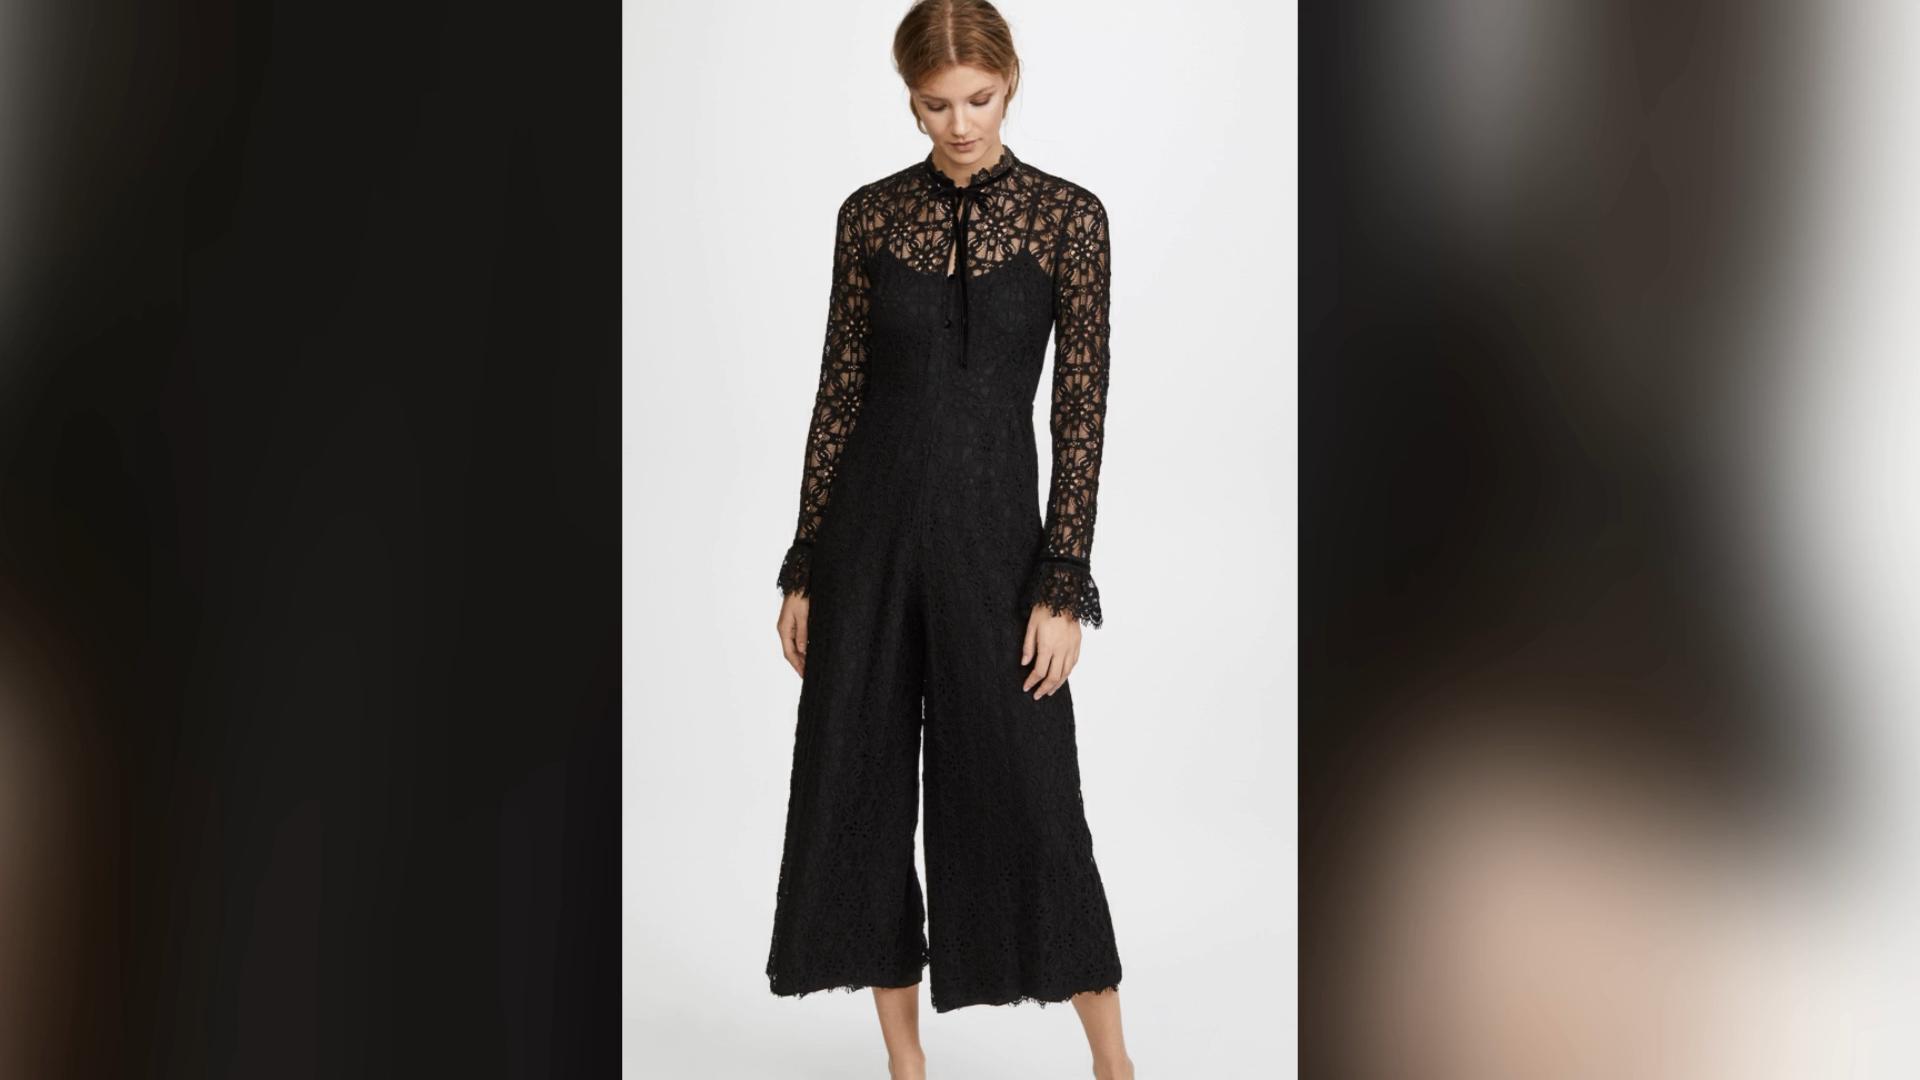 Fall clothing women romper black lace long sleeve casual women long wide leg ladies jumpsuits